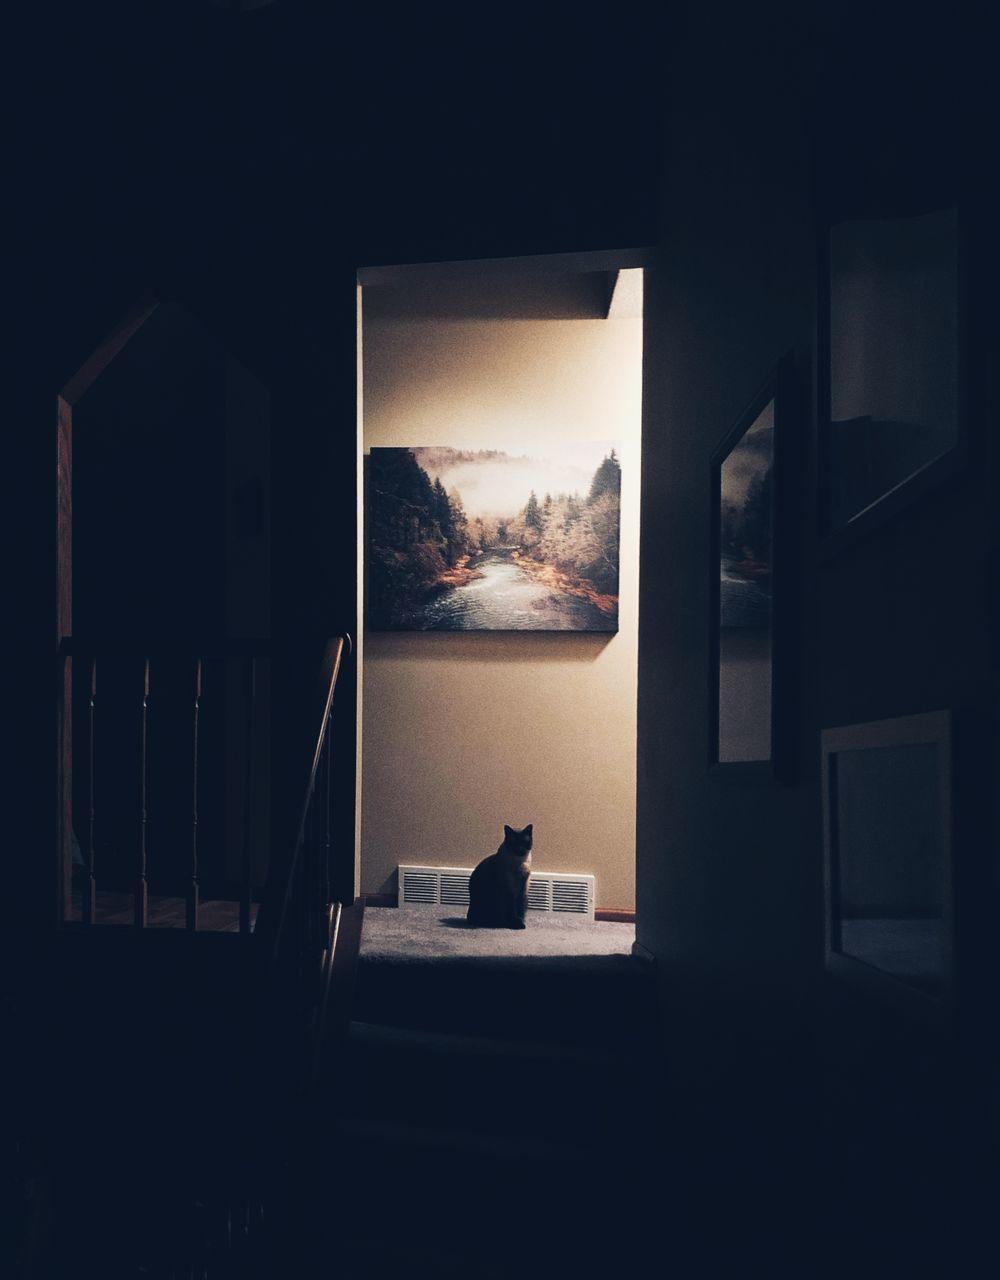 MAN SITTING AT WINDOW